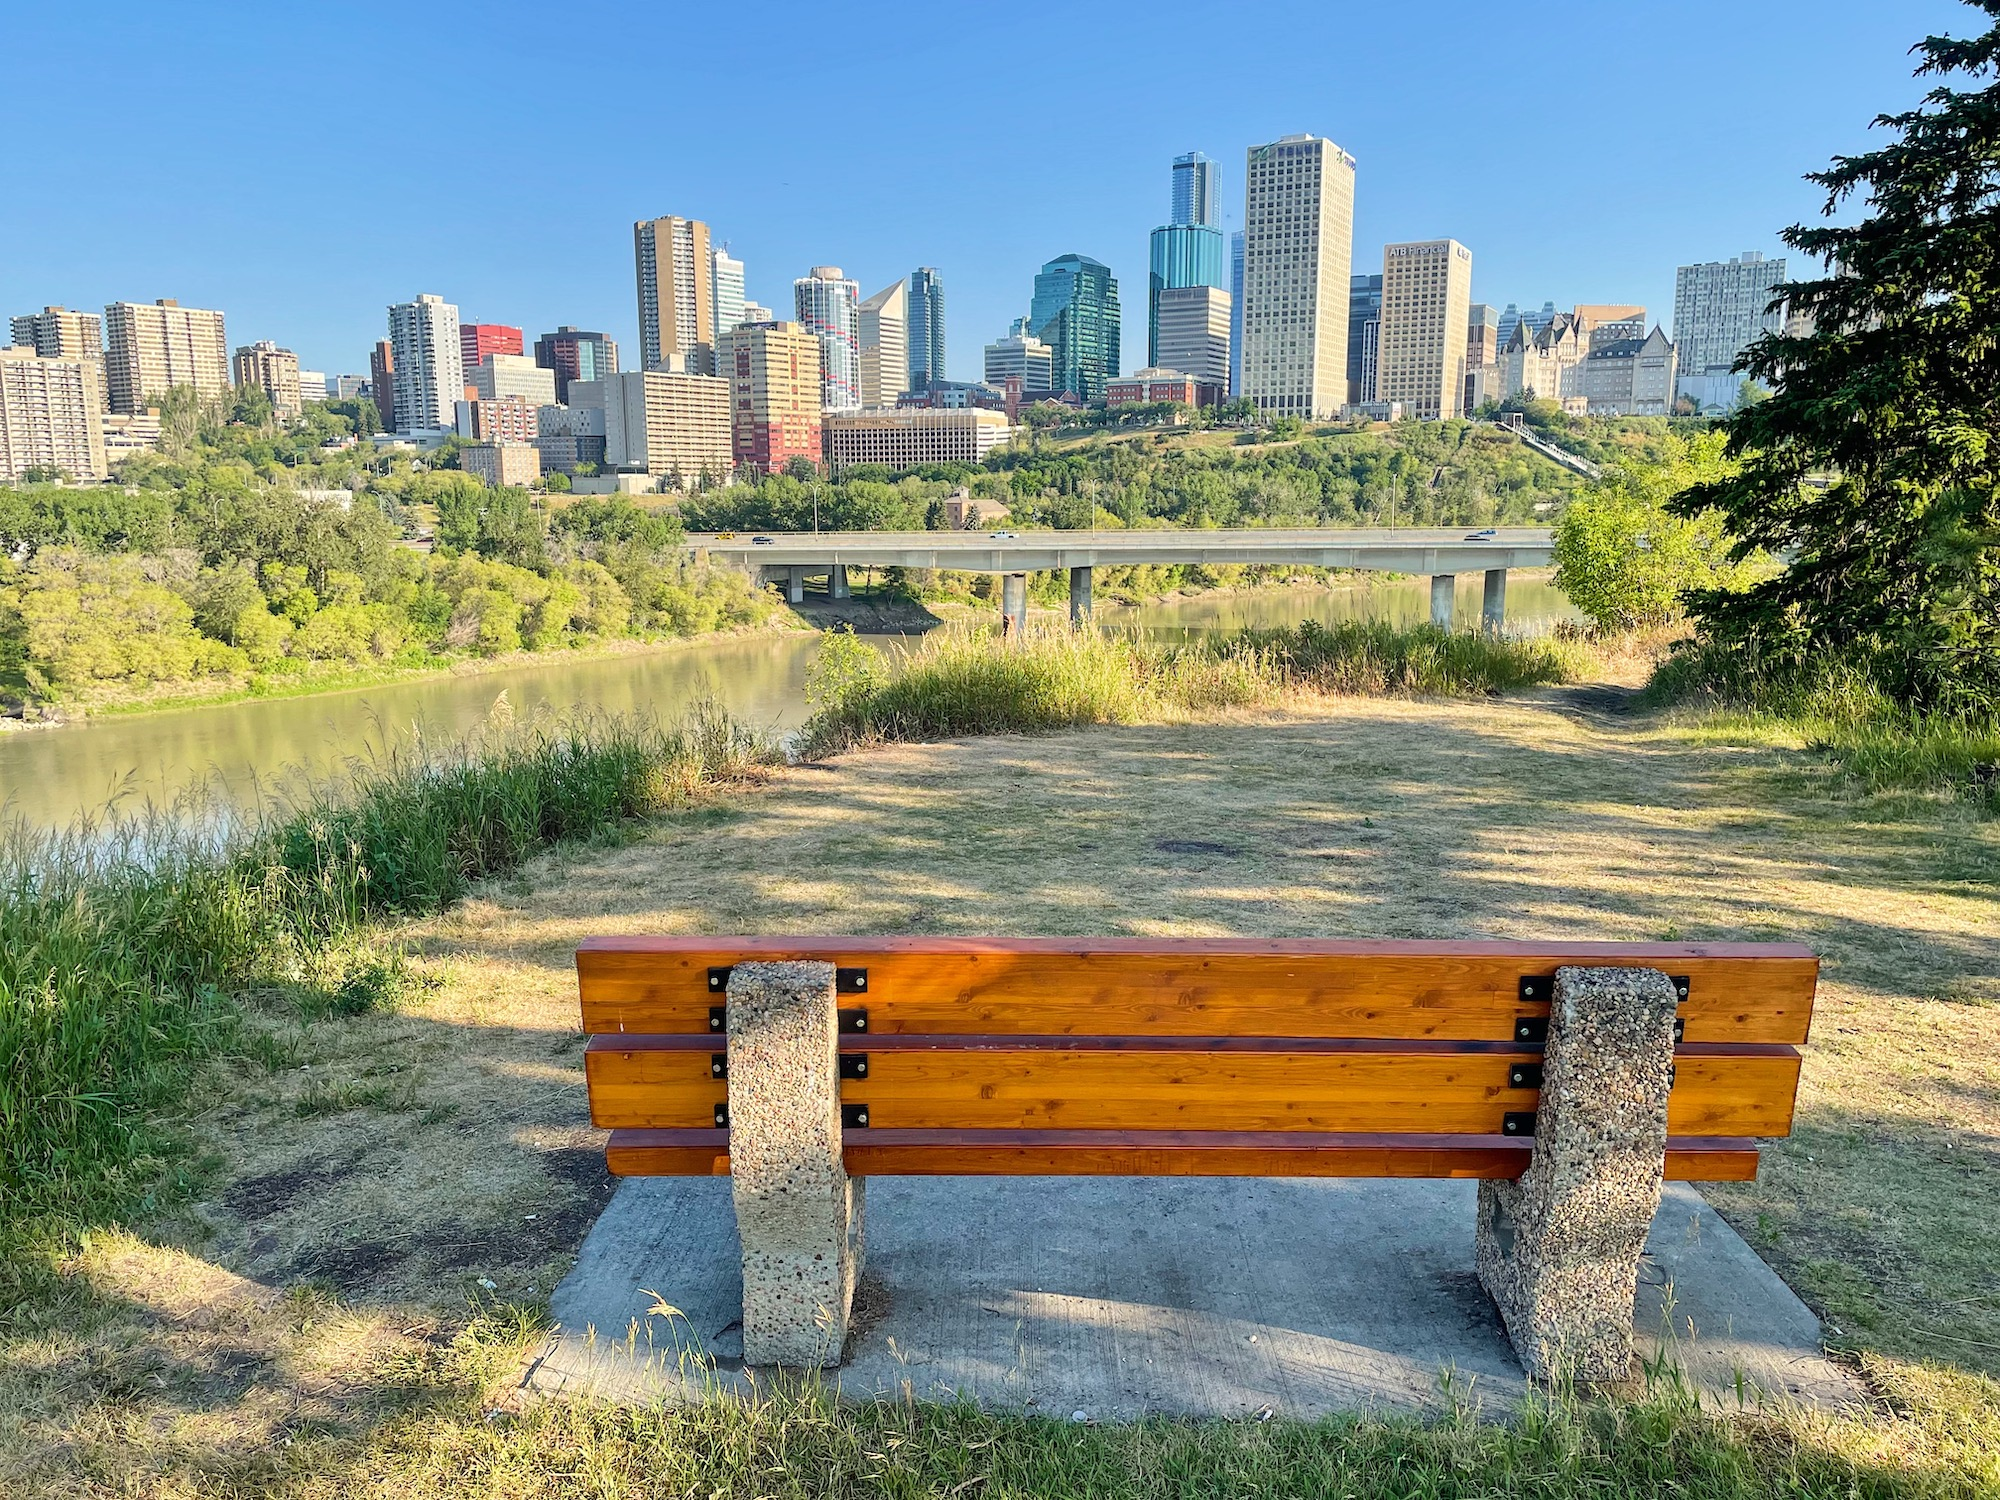 Biking in Edmonton: The Beautiful River Valley Trails via @outandacross